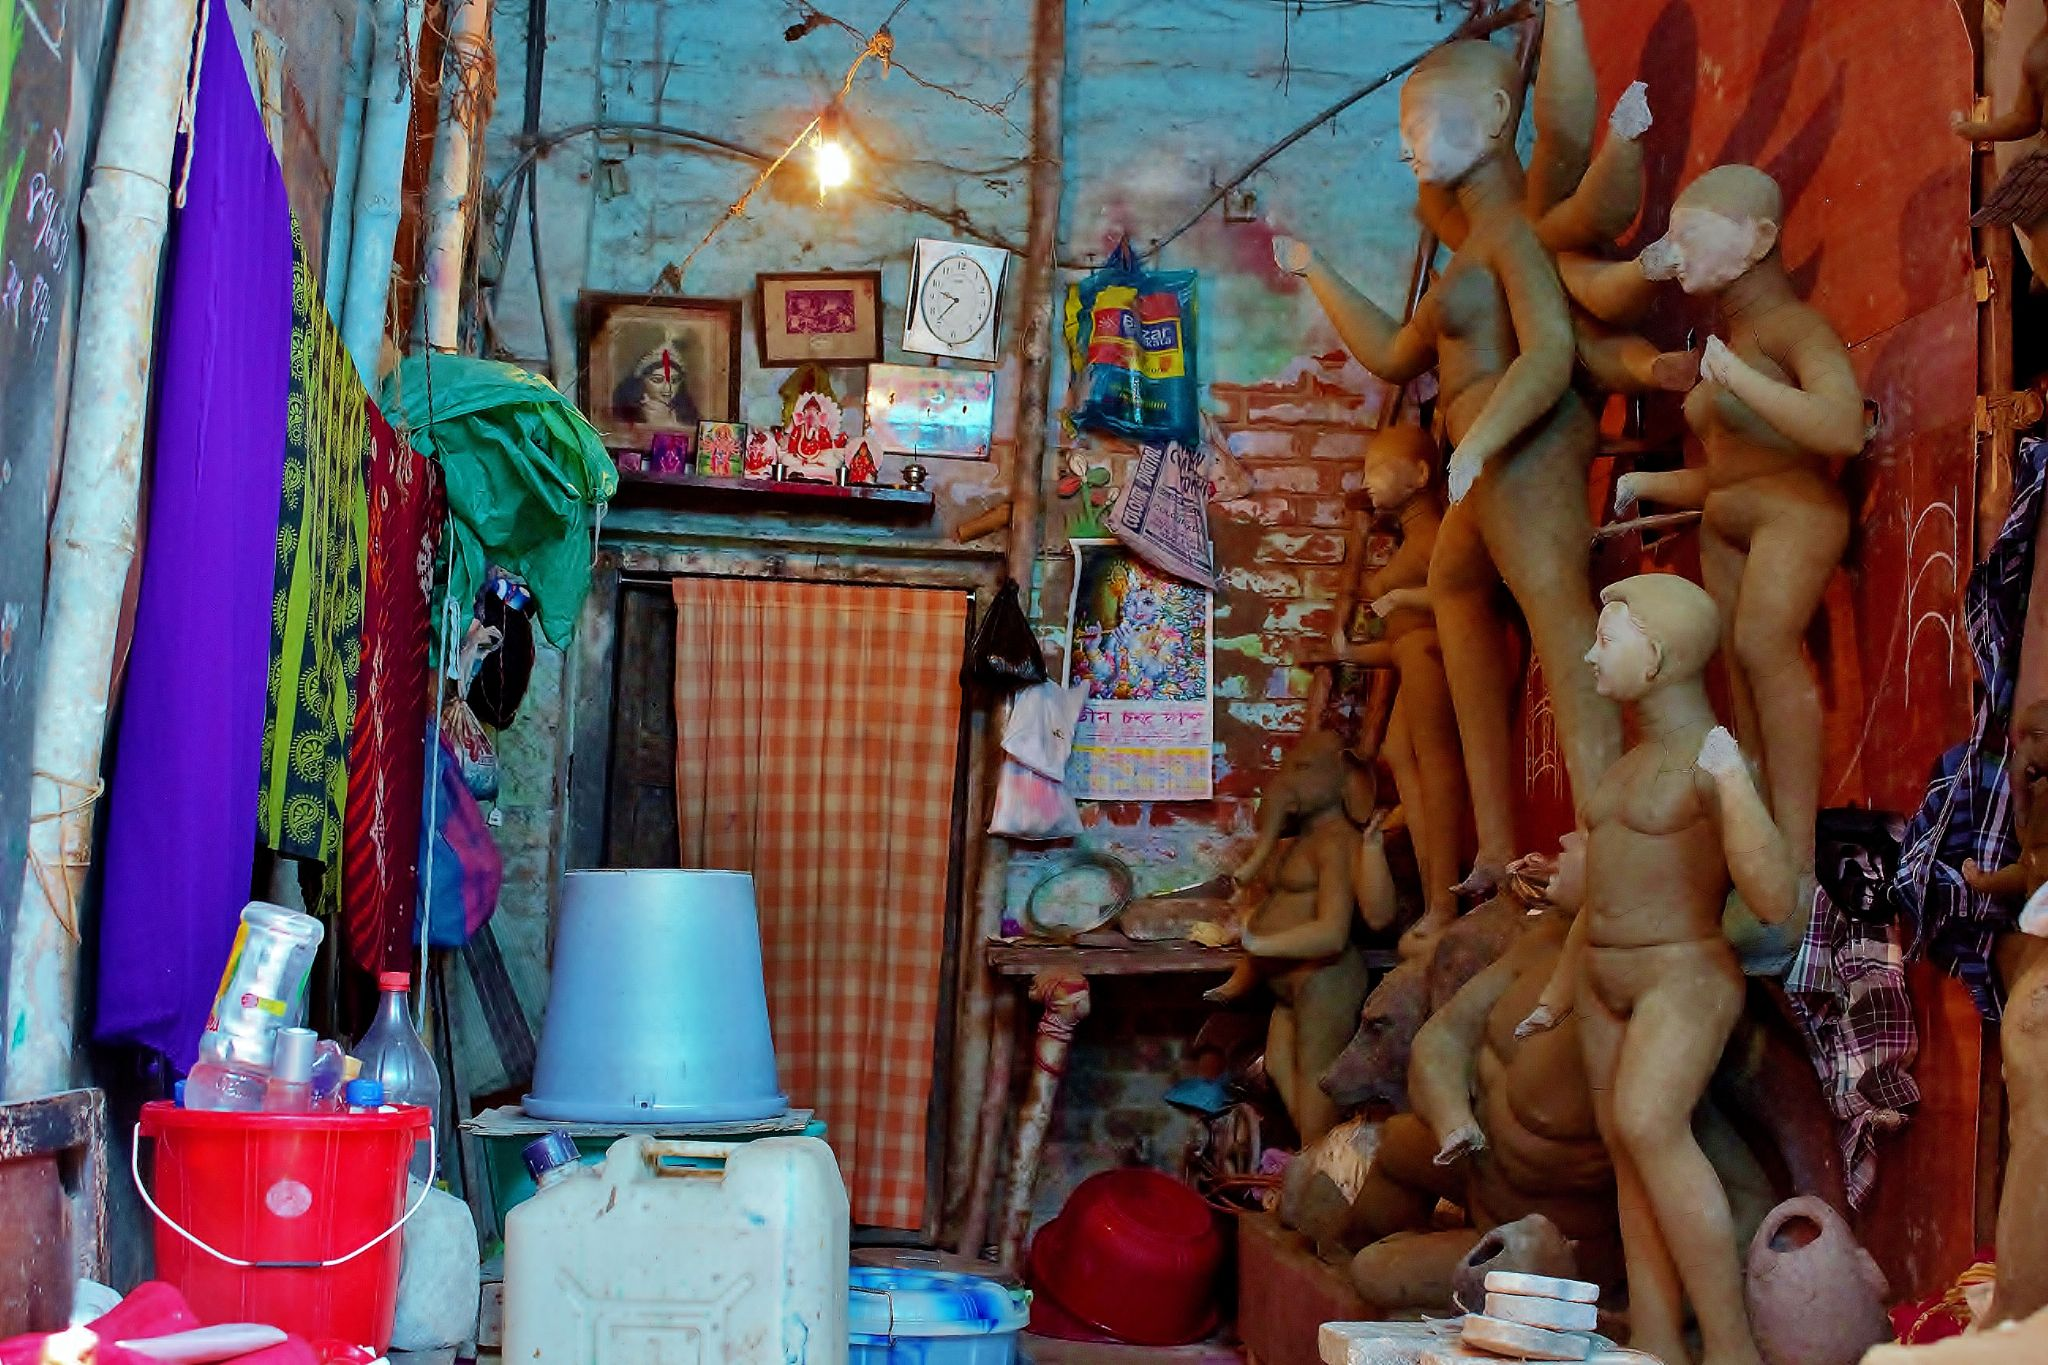 all in a small room by Shuvarthy Chowdhury